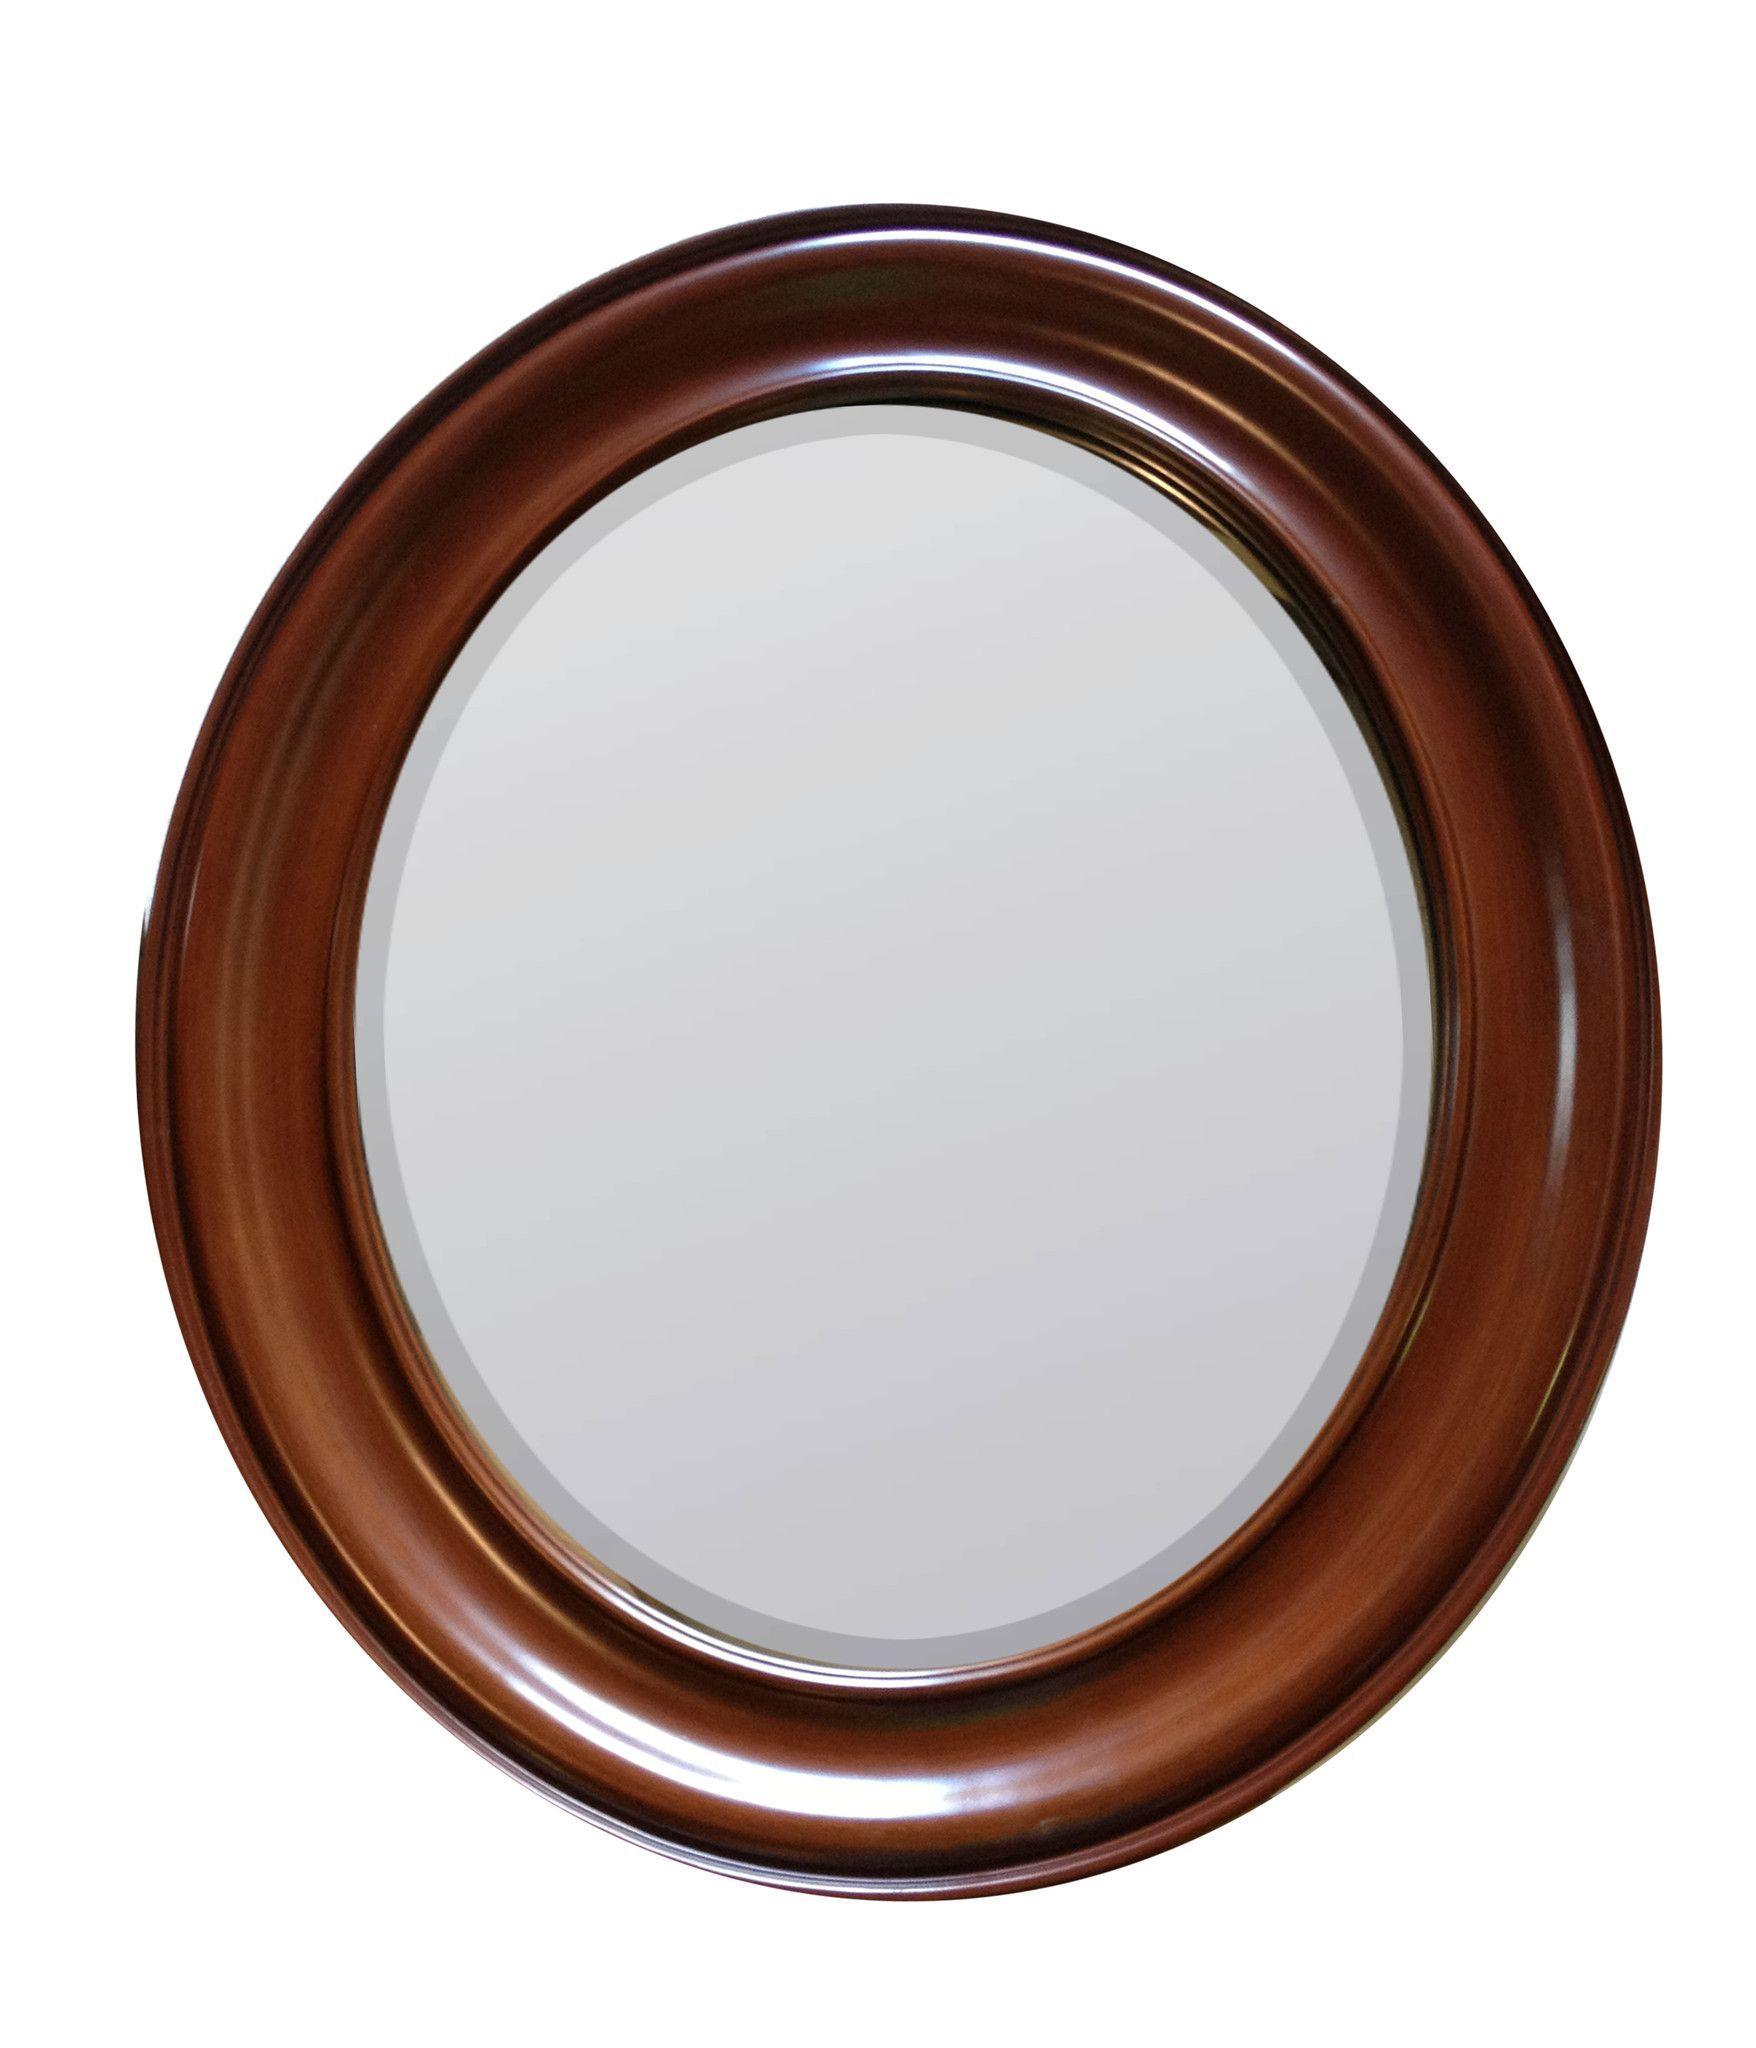 Booker Mirror Gesso over wood